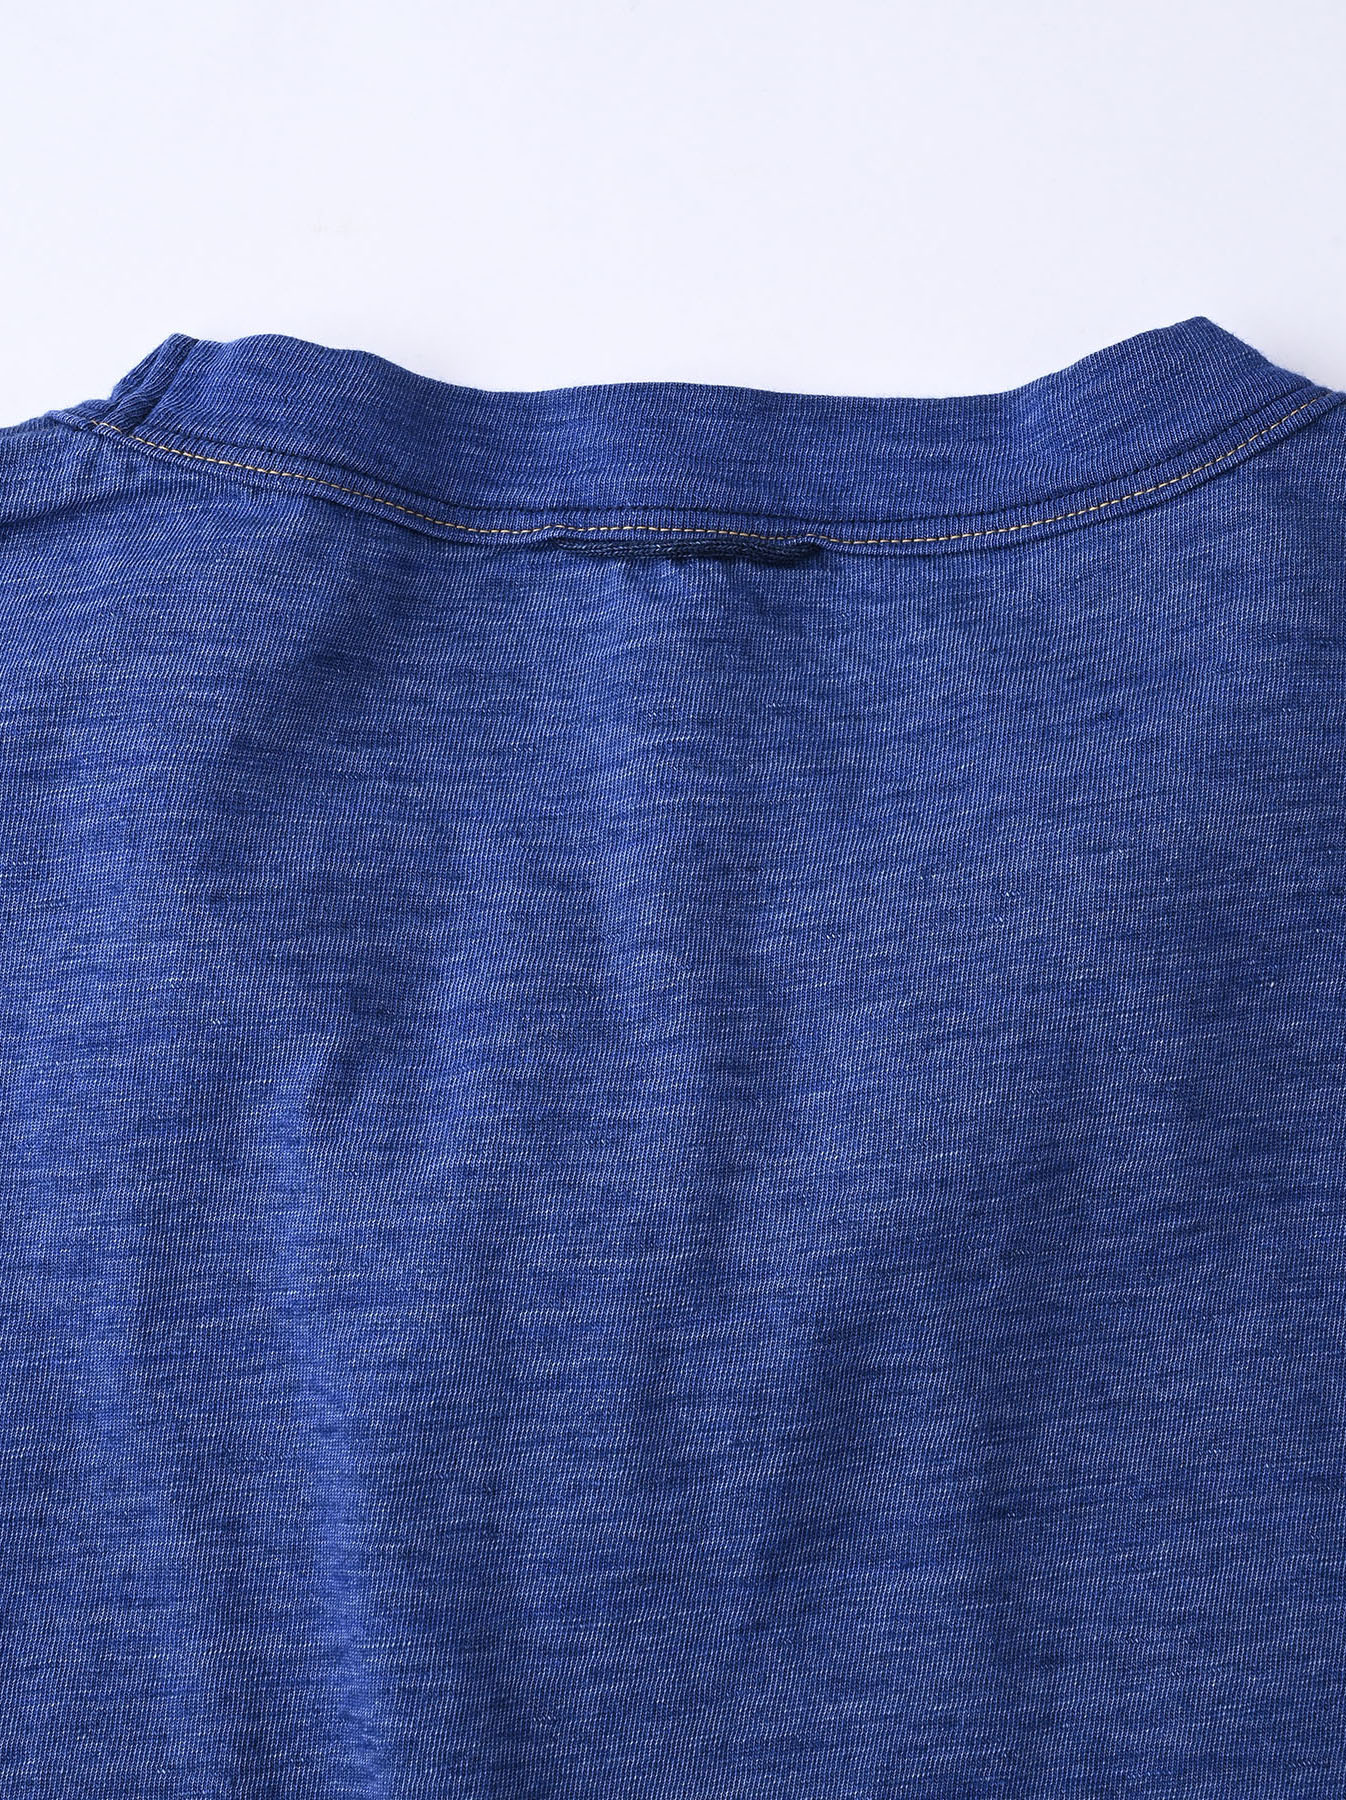 Indigo Tenjiku Lei Frill Ocean T-shirt (0621)-9